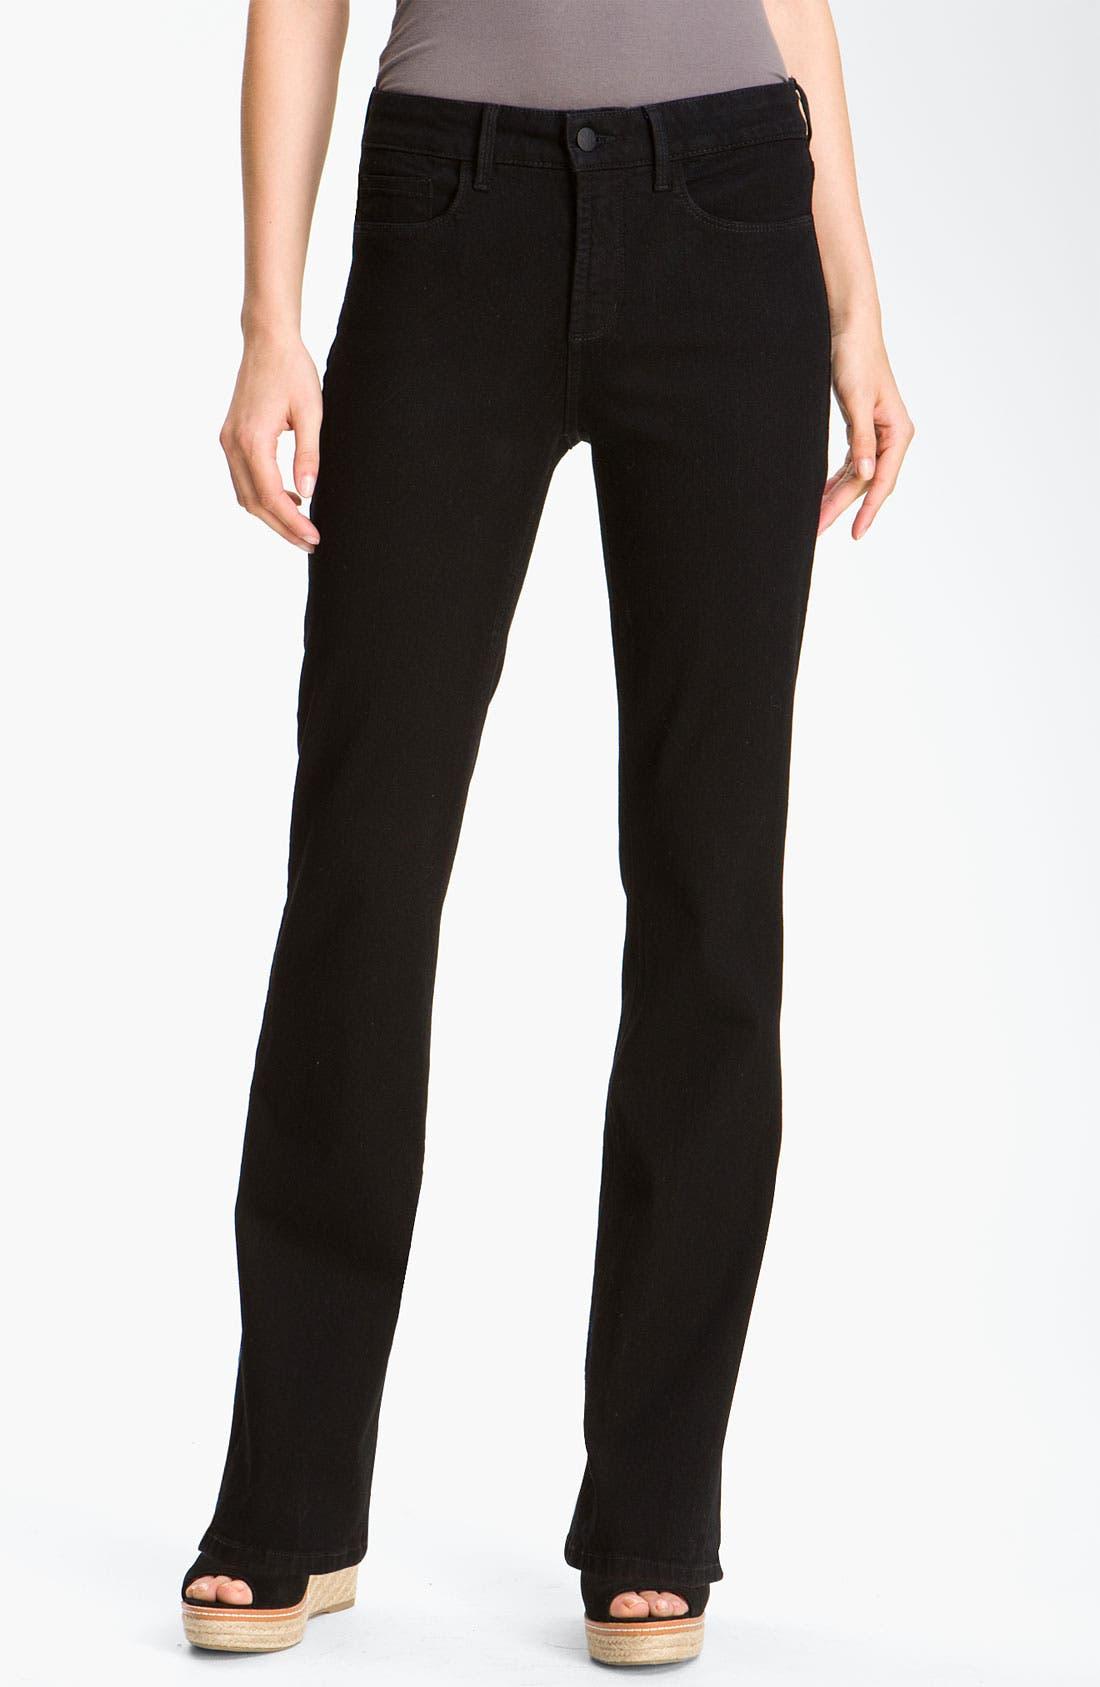 Main Image - NYDJ 'Barbara' Embellished Bootcut Jeans (Petite)